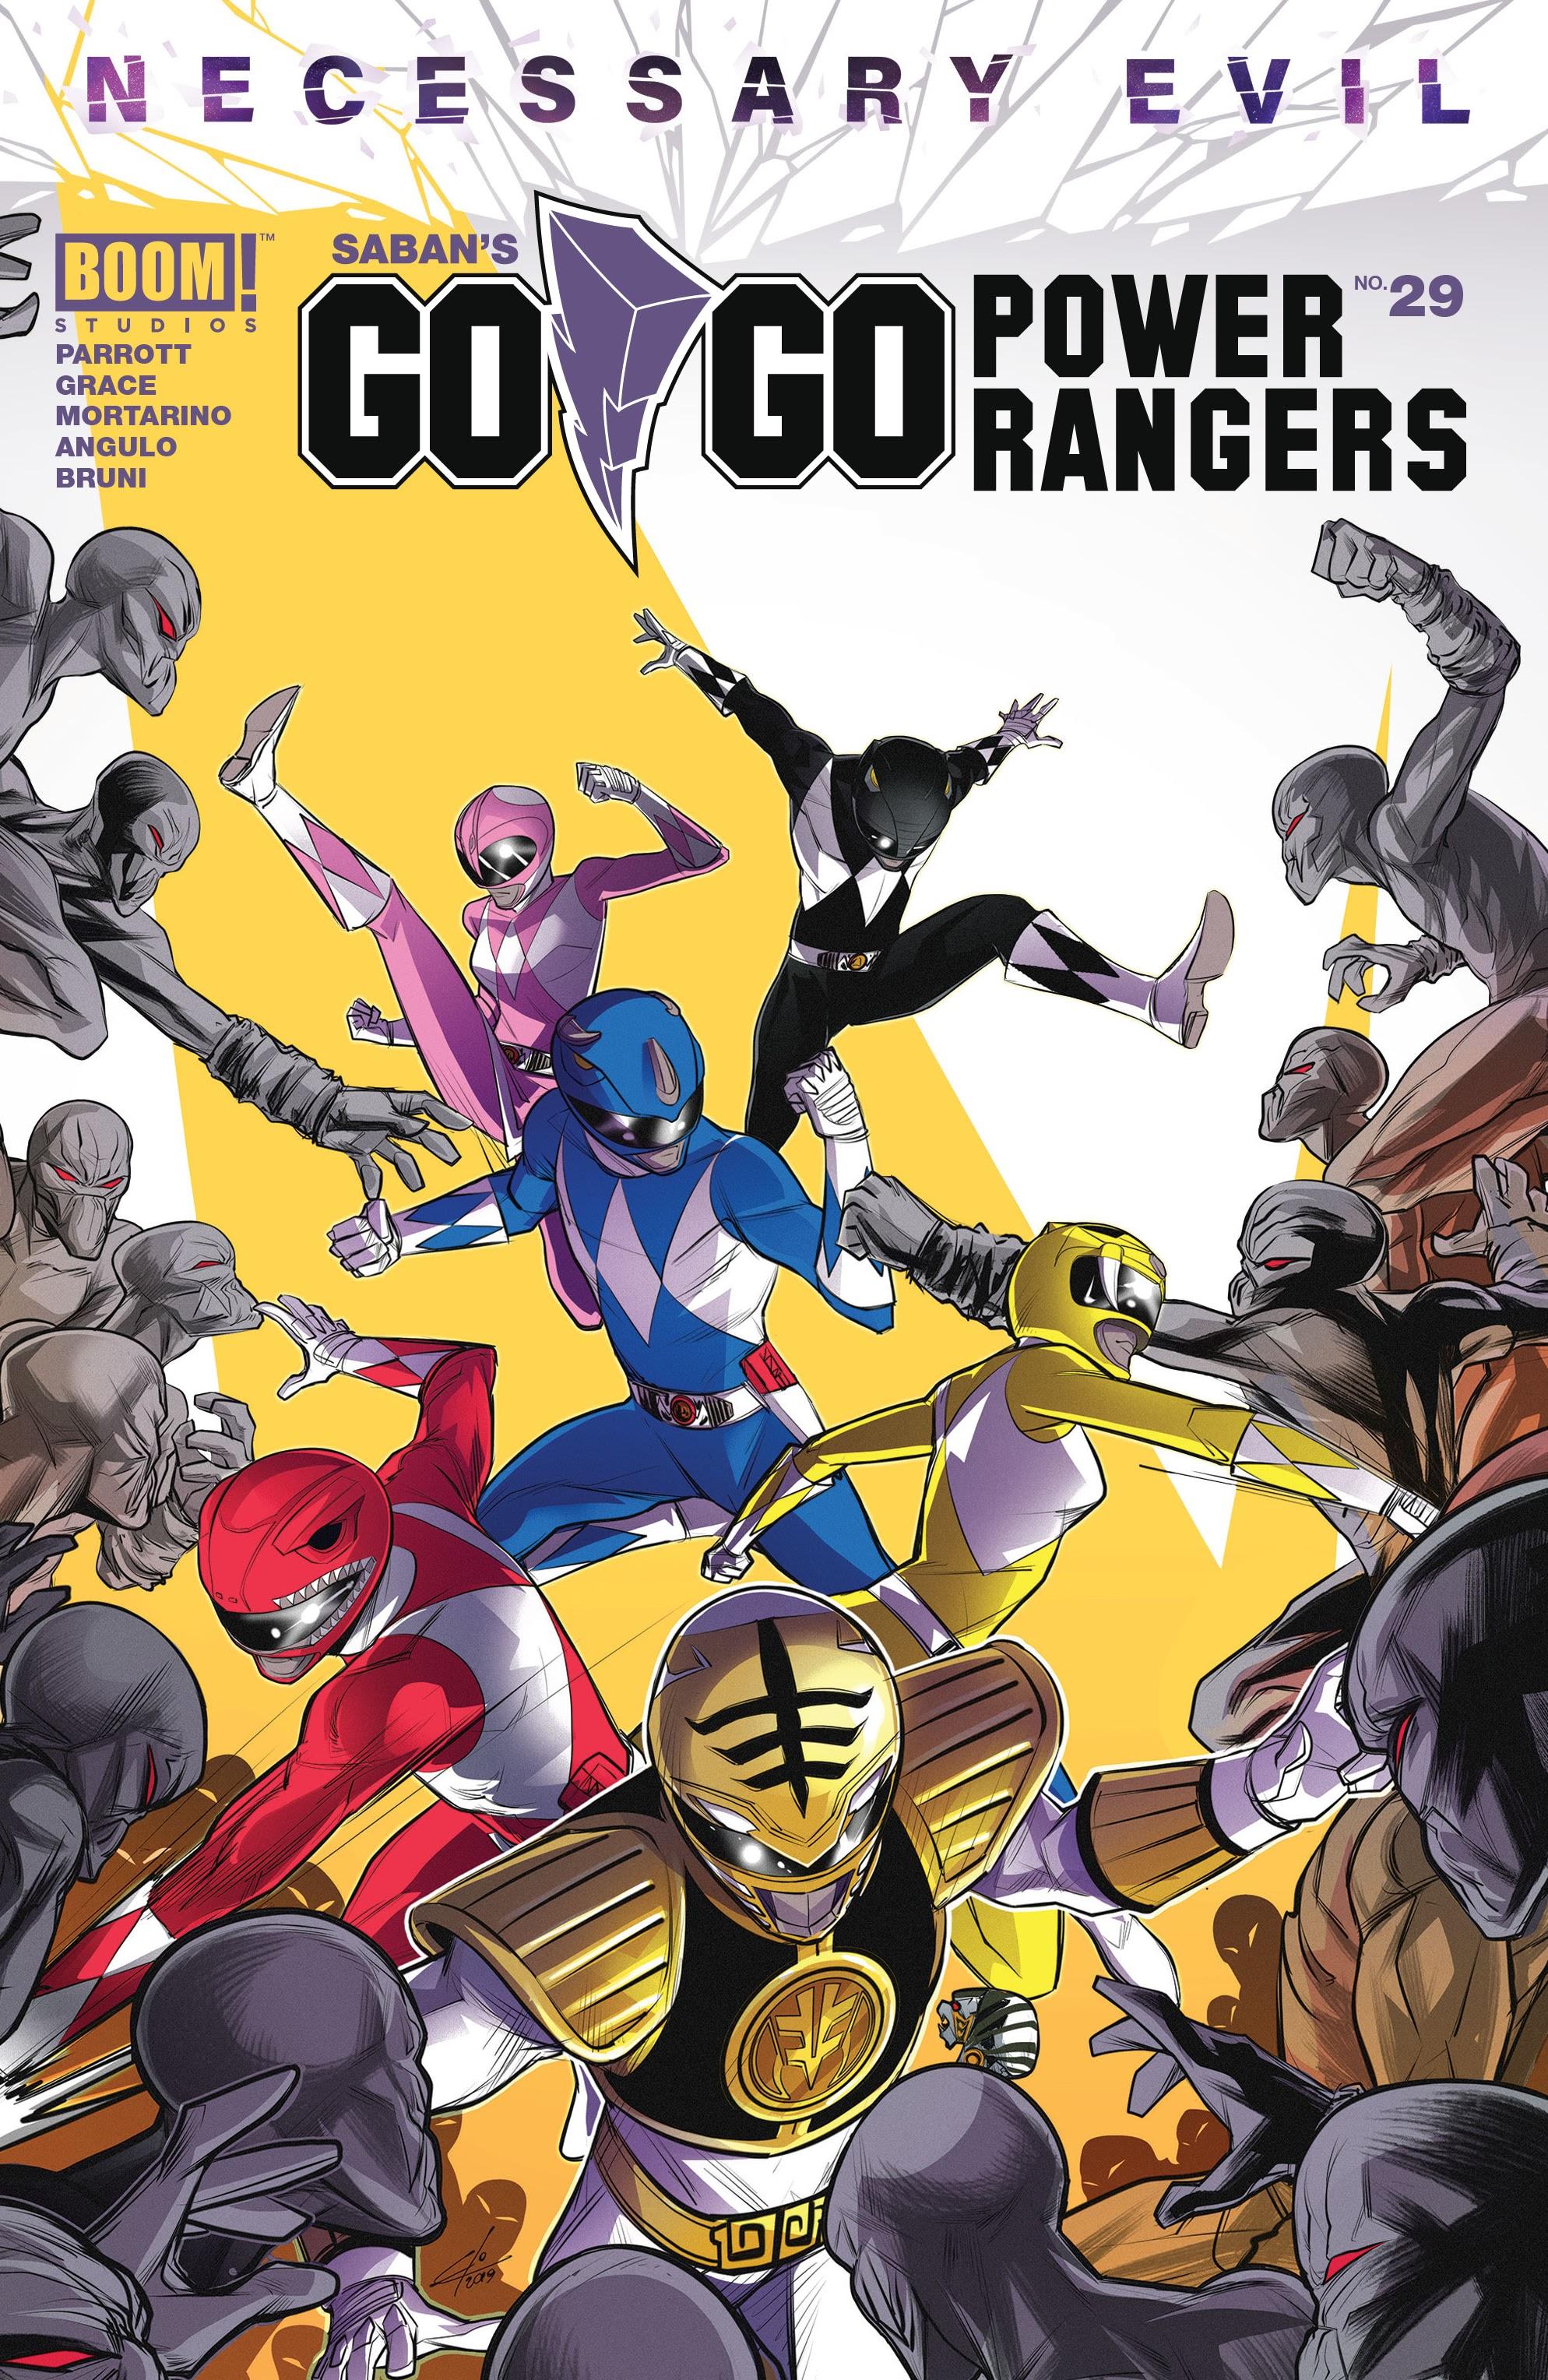 Sabans Go Go Power Rangers 29 Page 1